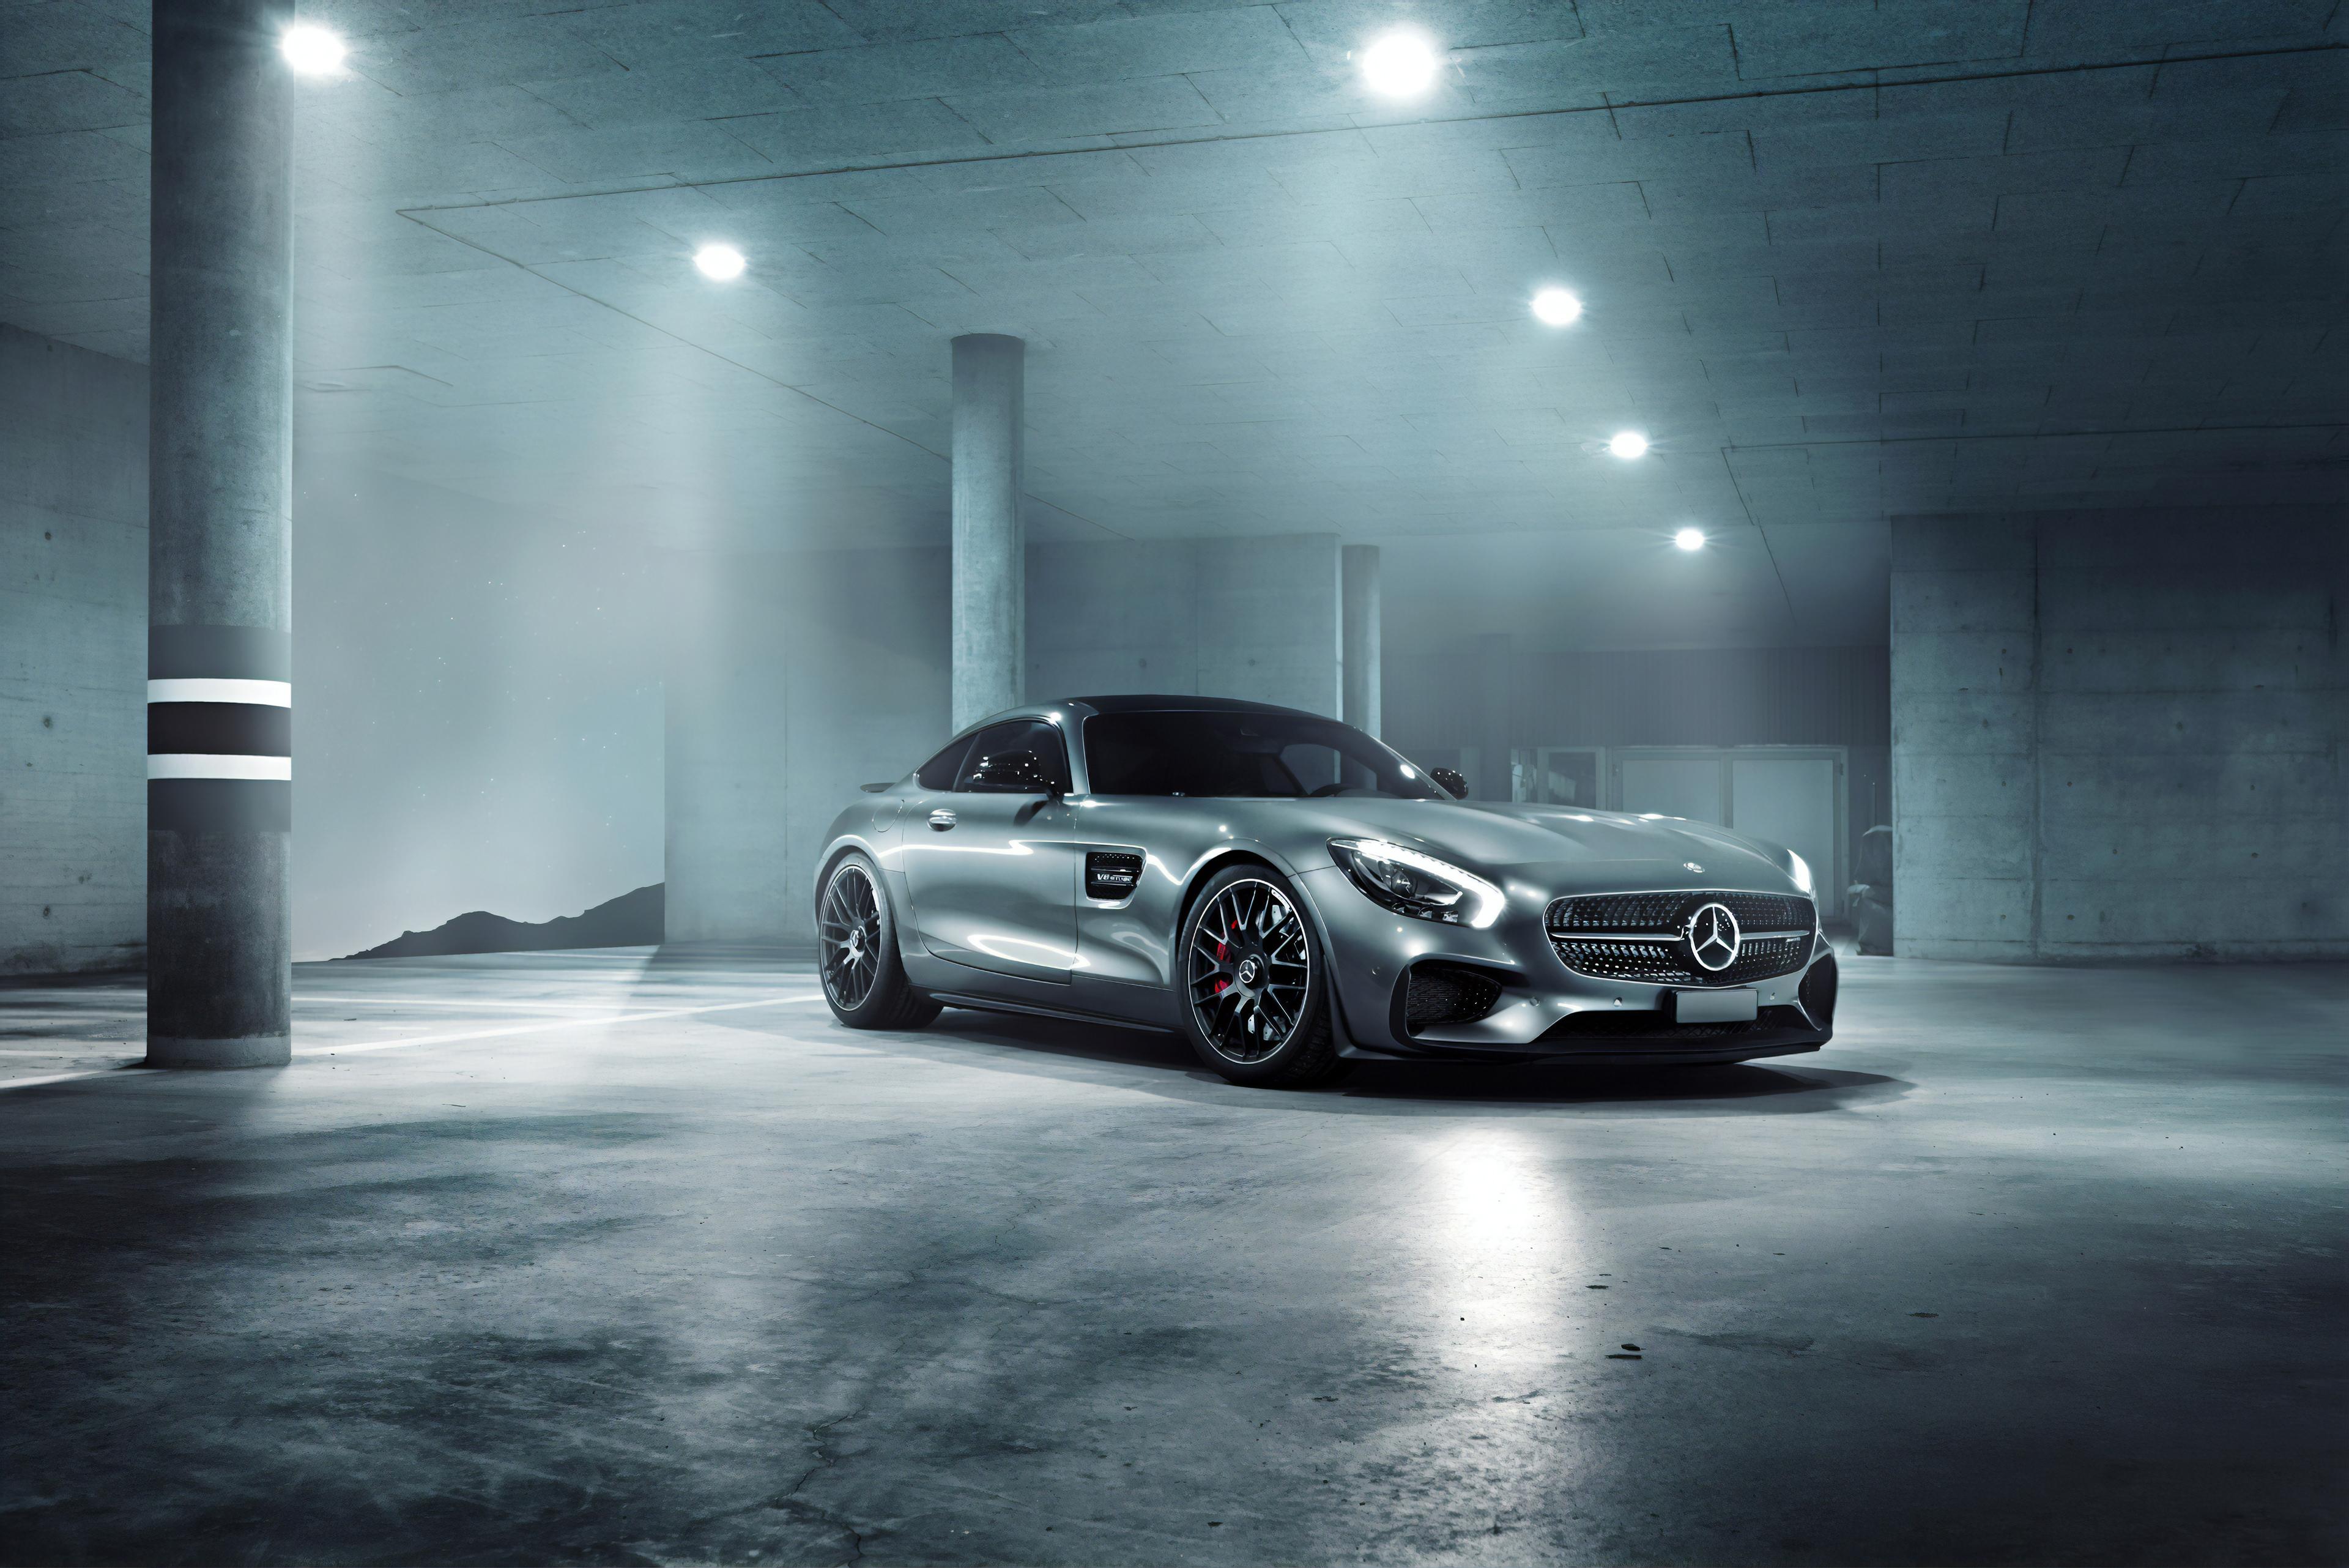 Grey Mercedes Benz Amg GT 4k, HD Cars, 4k Wallpapers ...